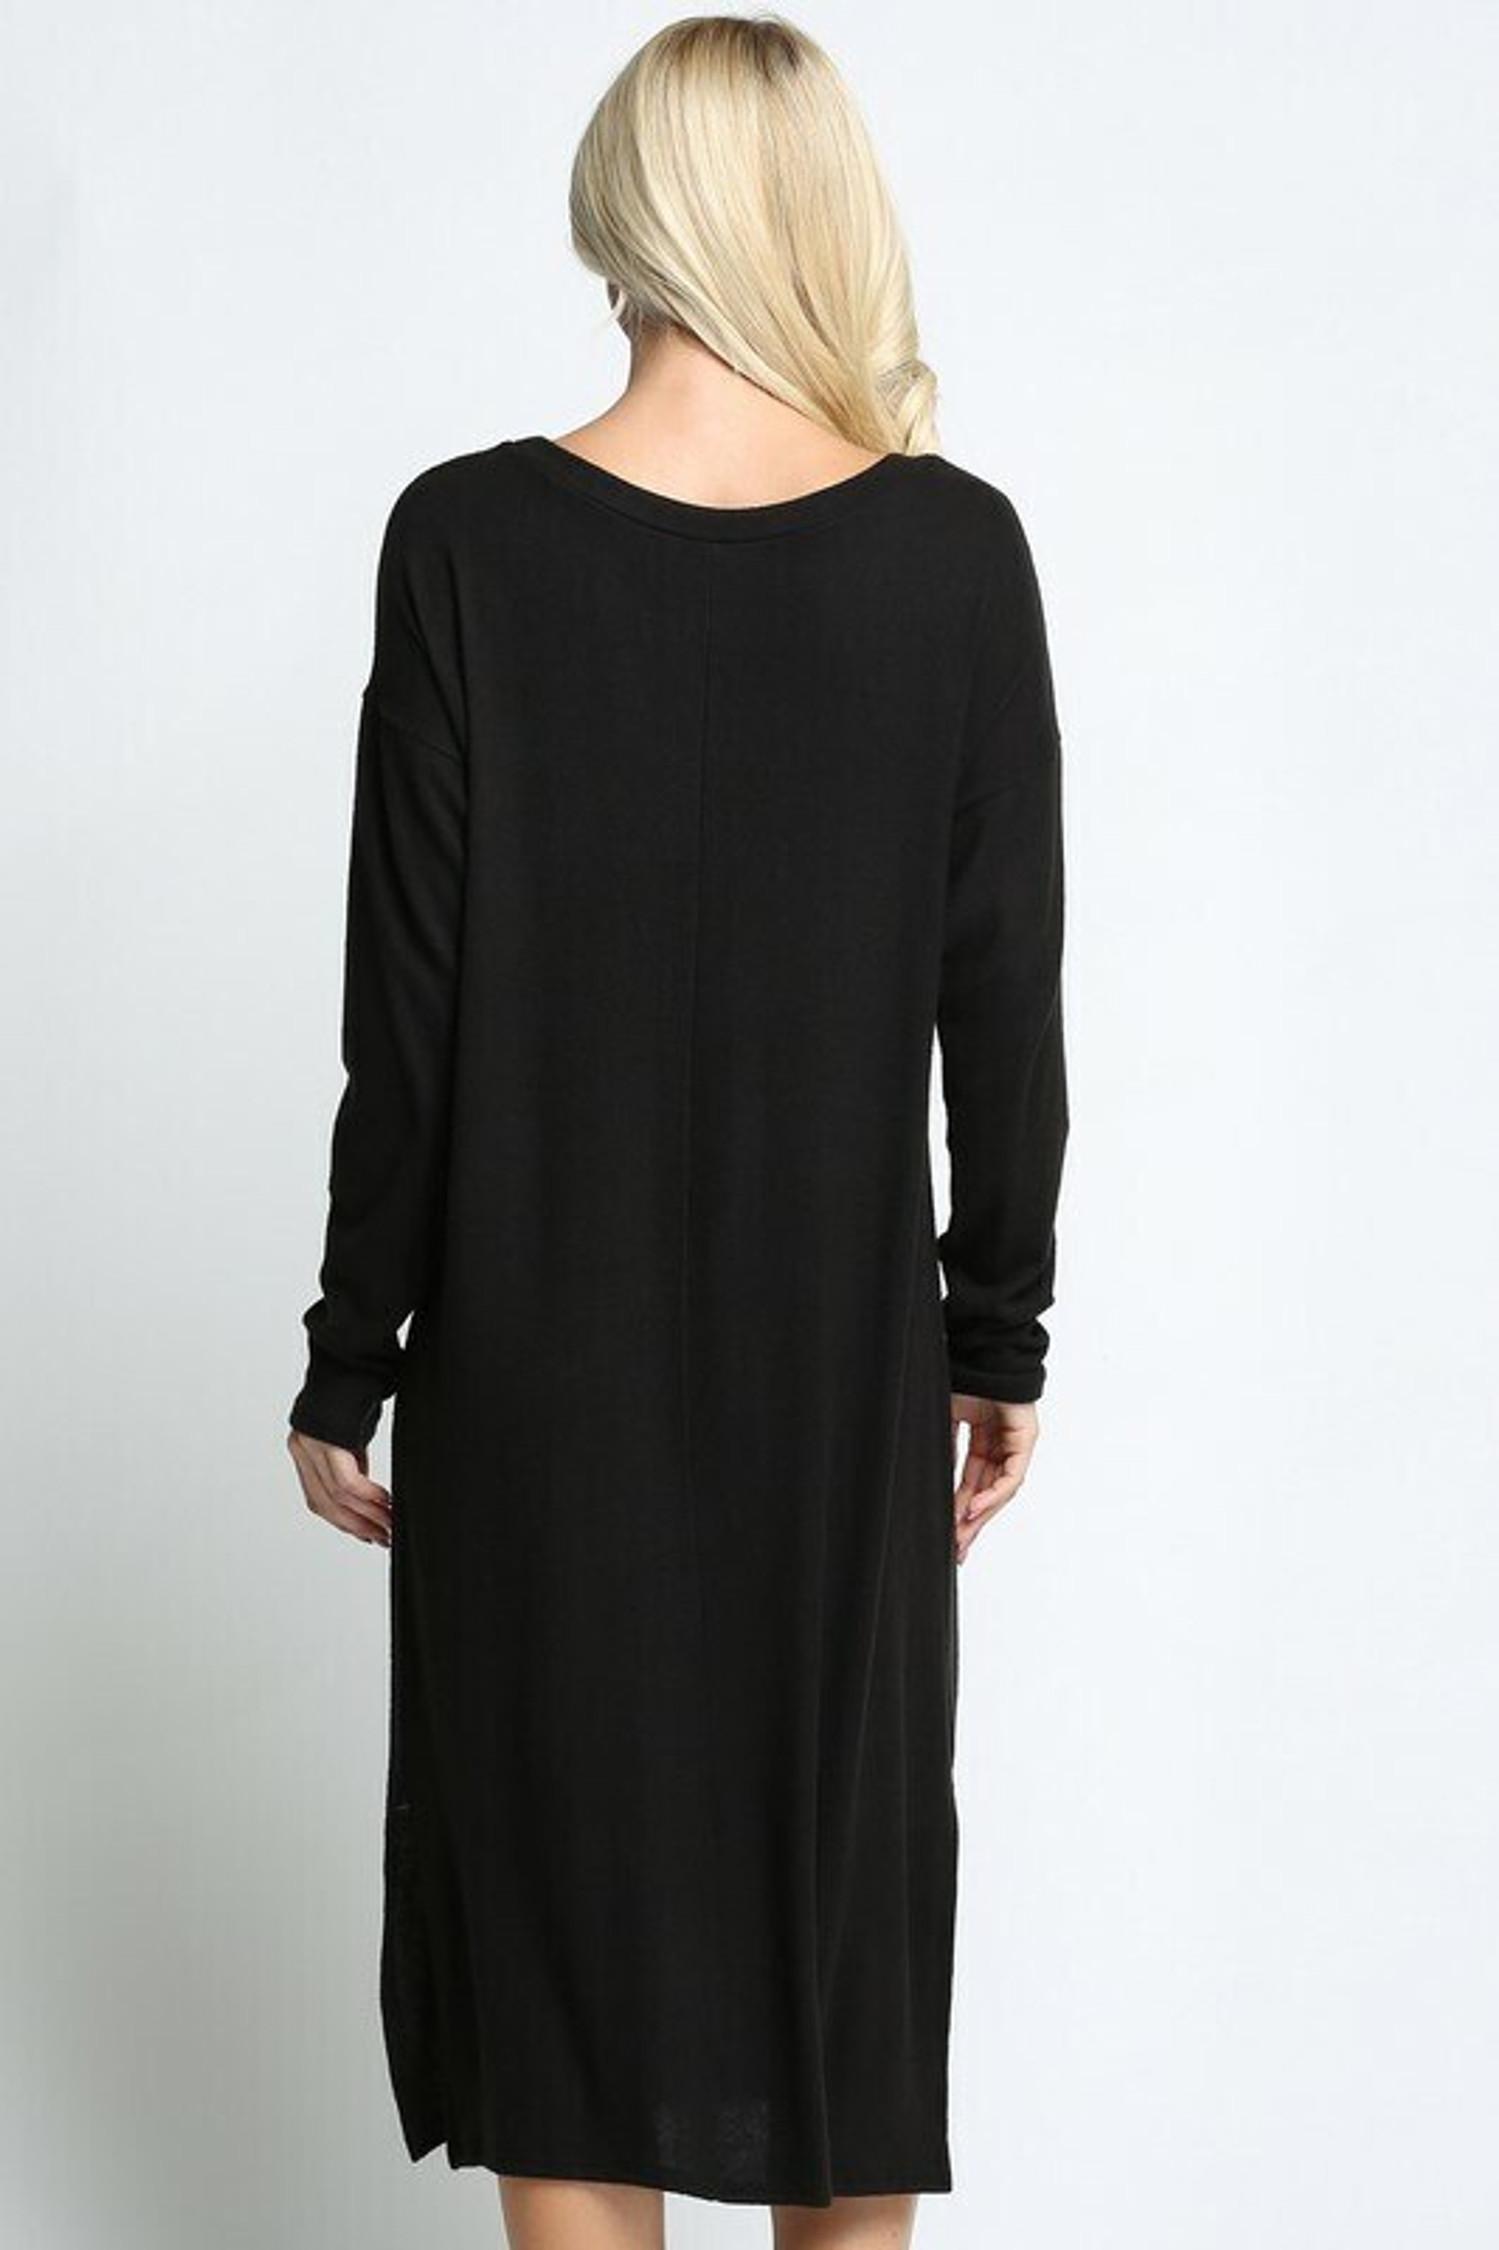 Black Long Sleeve Side Slit Midi Length Sweater Dress